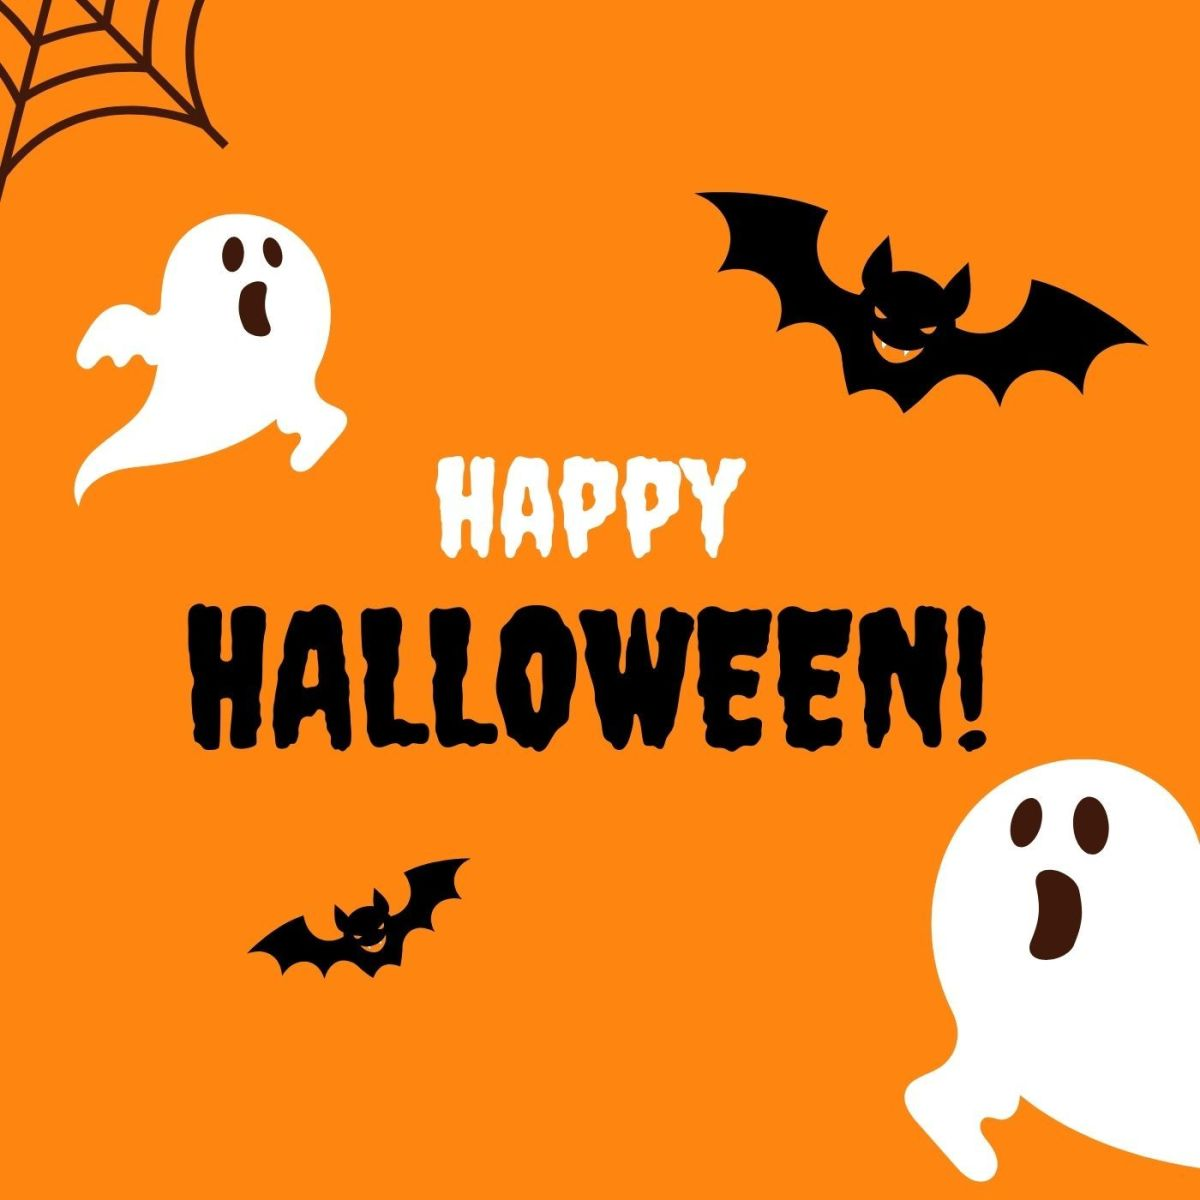 Happy haunting and happy Halloween!